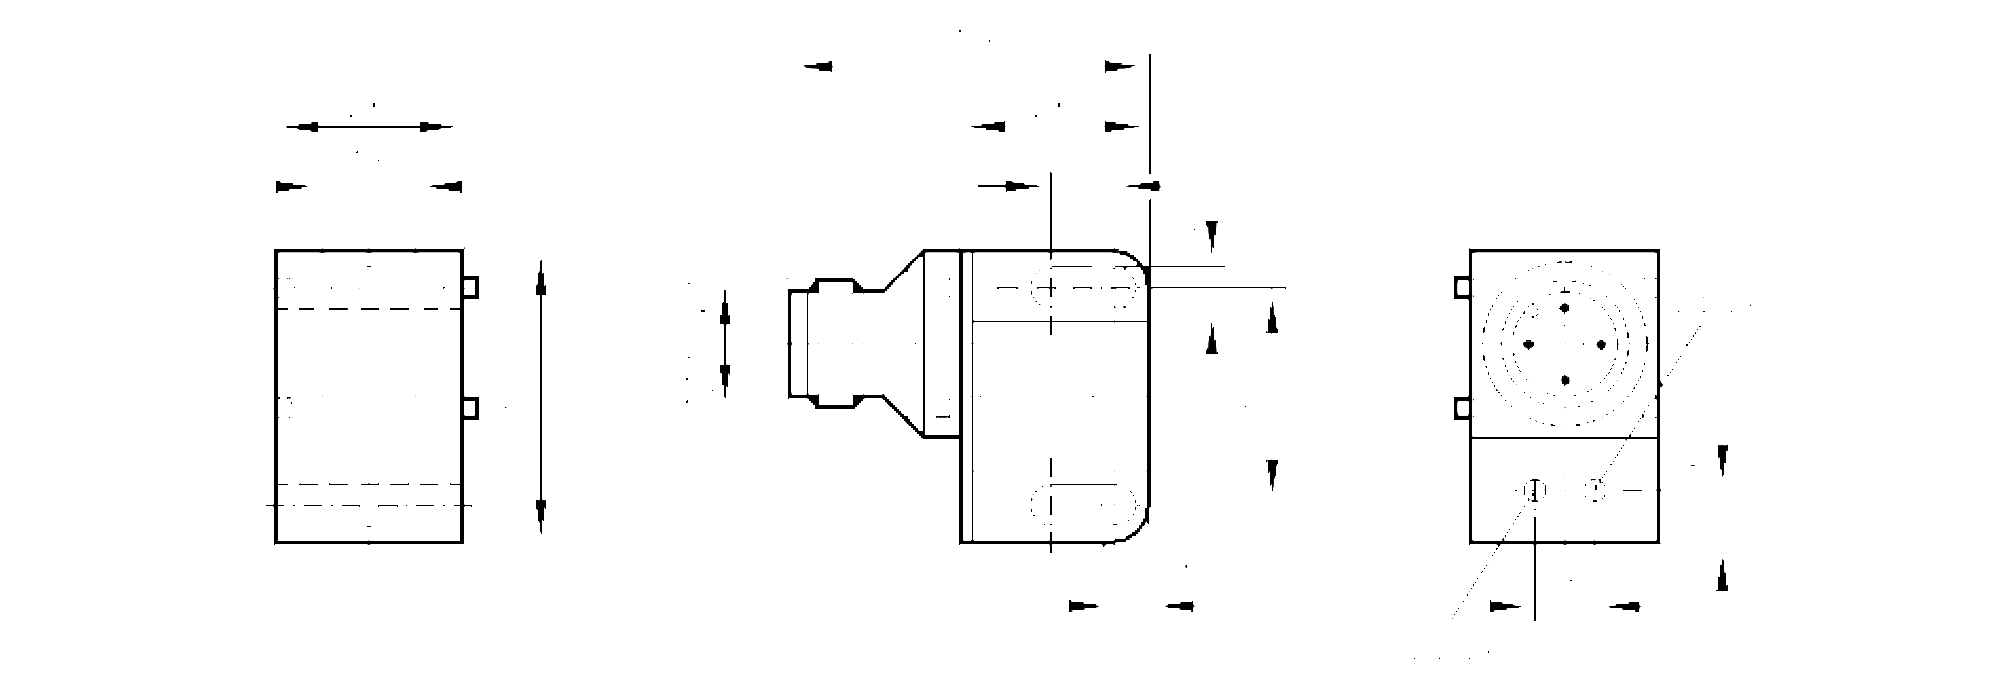 nn5013 - inductive namur dual sensor for valve actuators